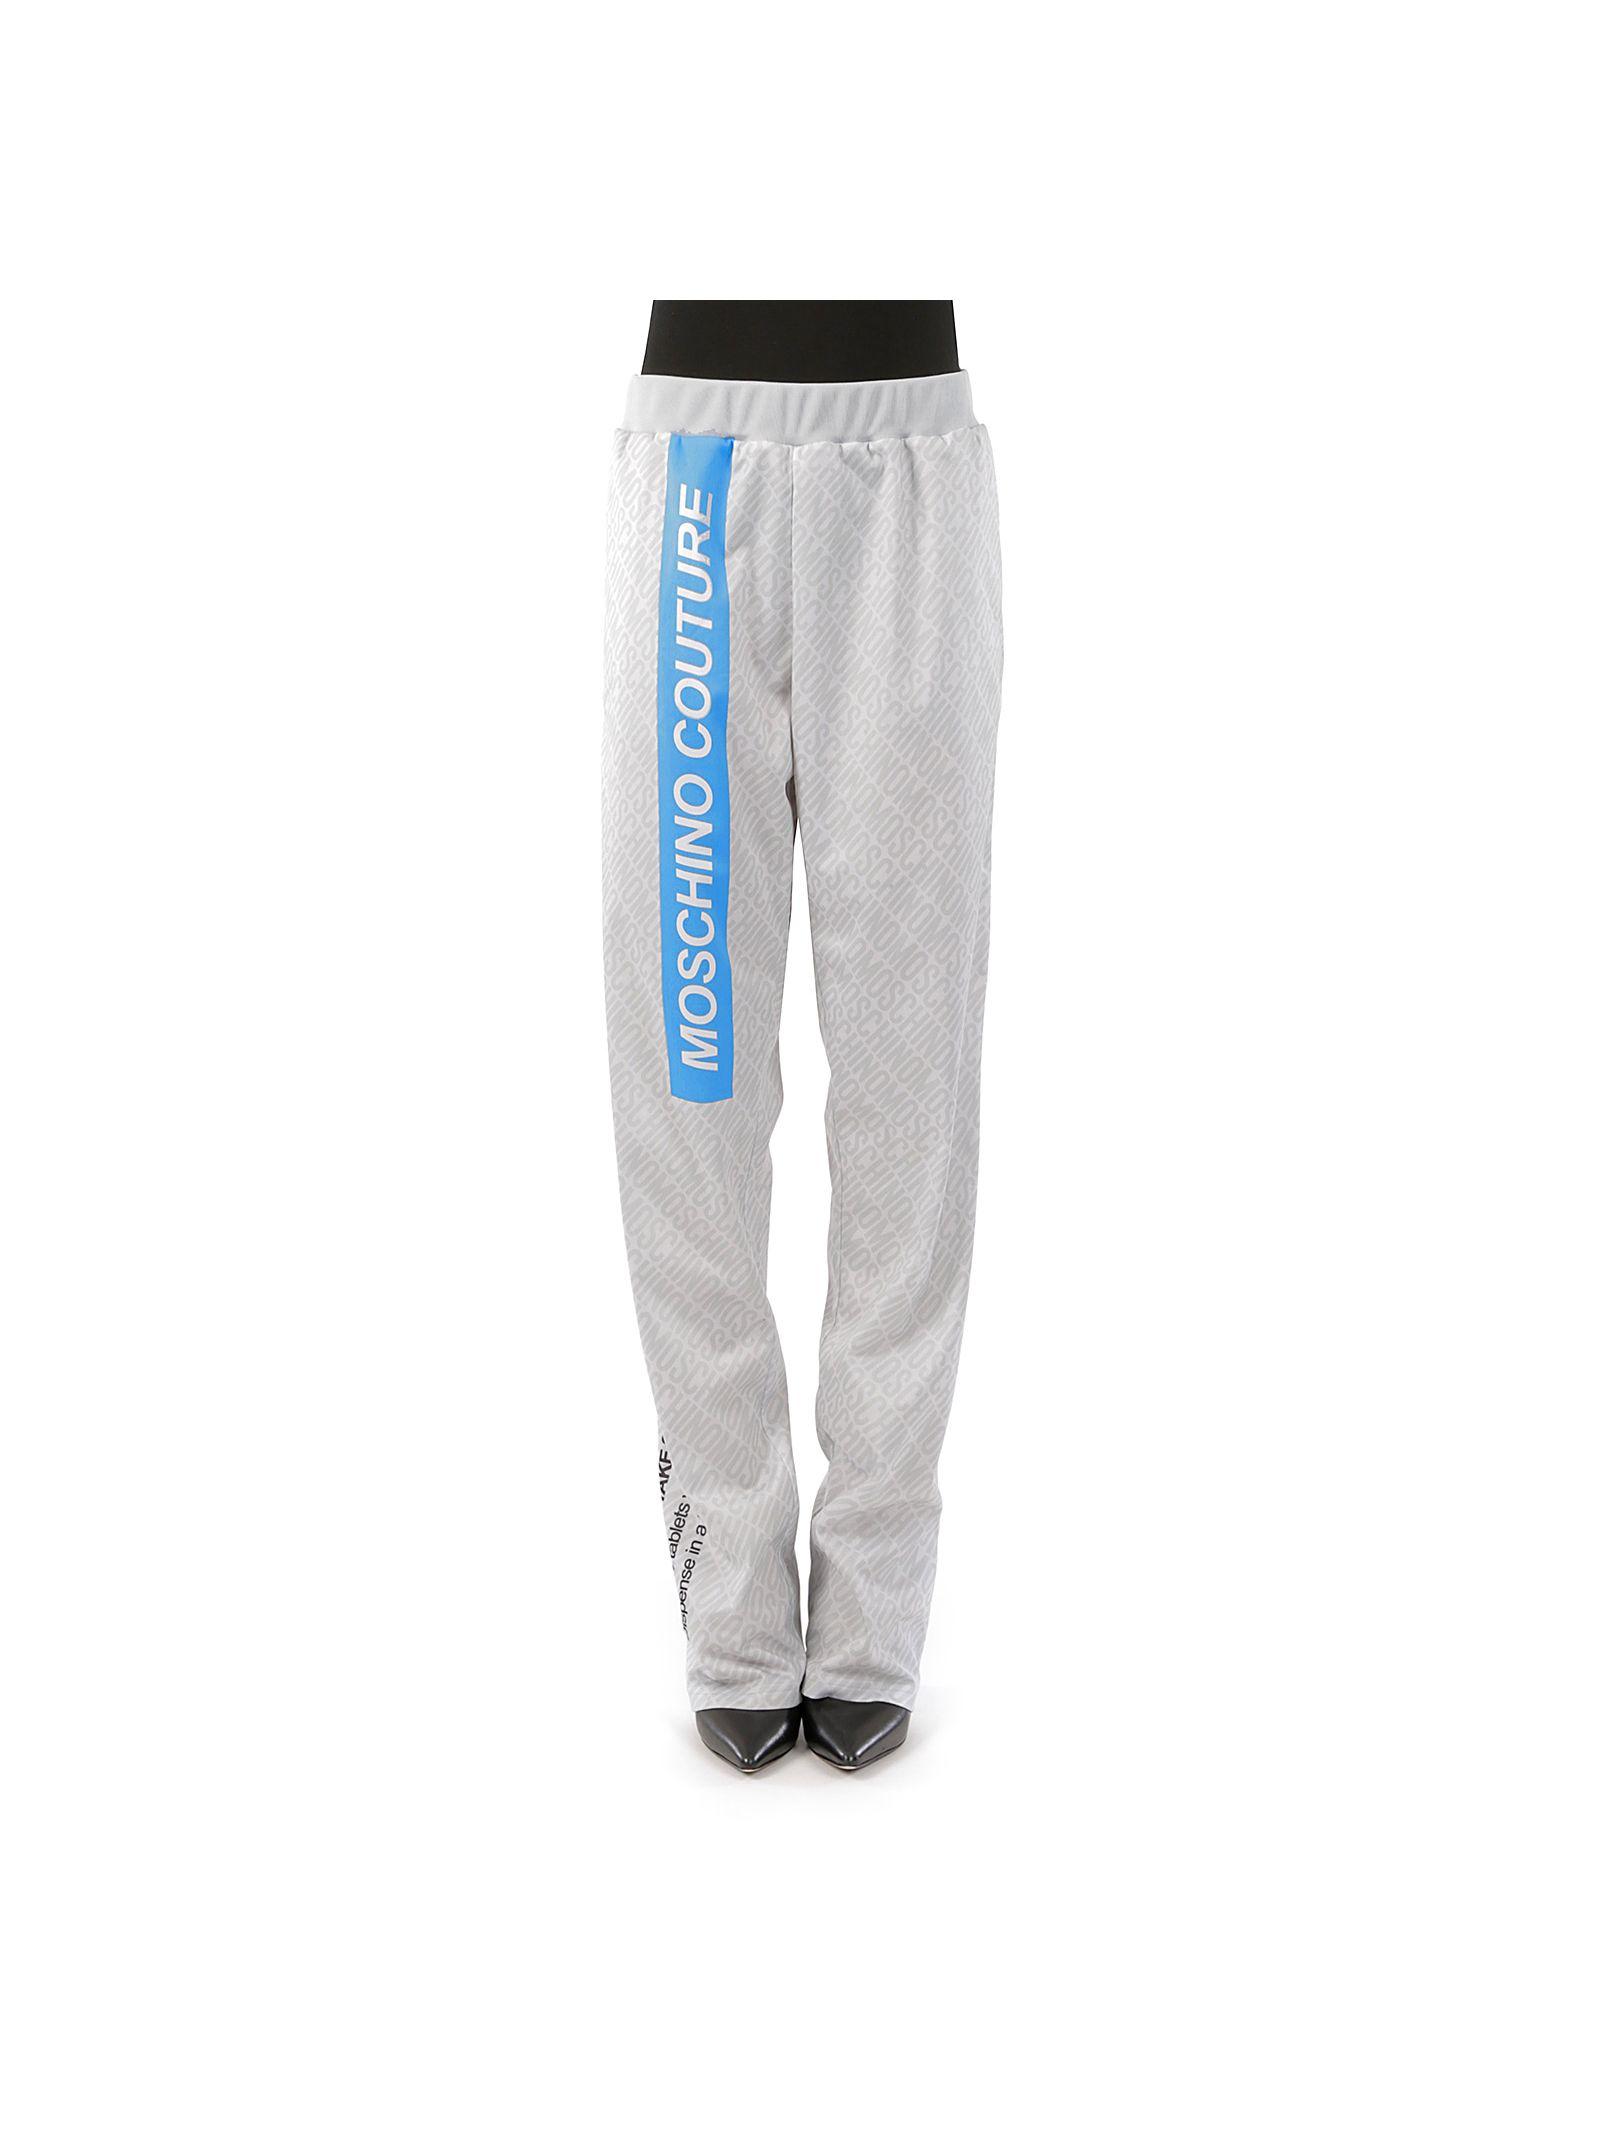 Pantaloni sport MOSCHINO, casual, pentru femei